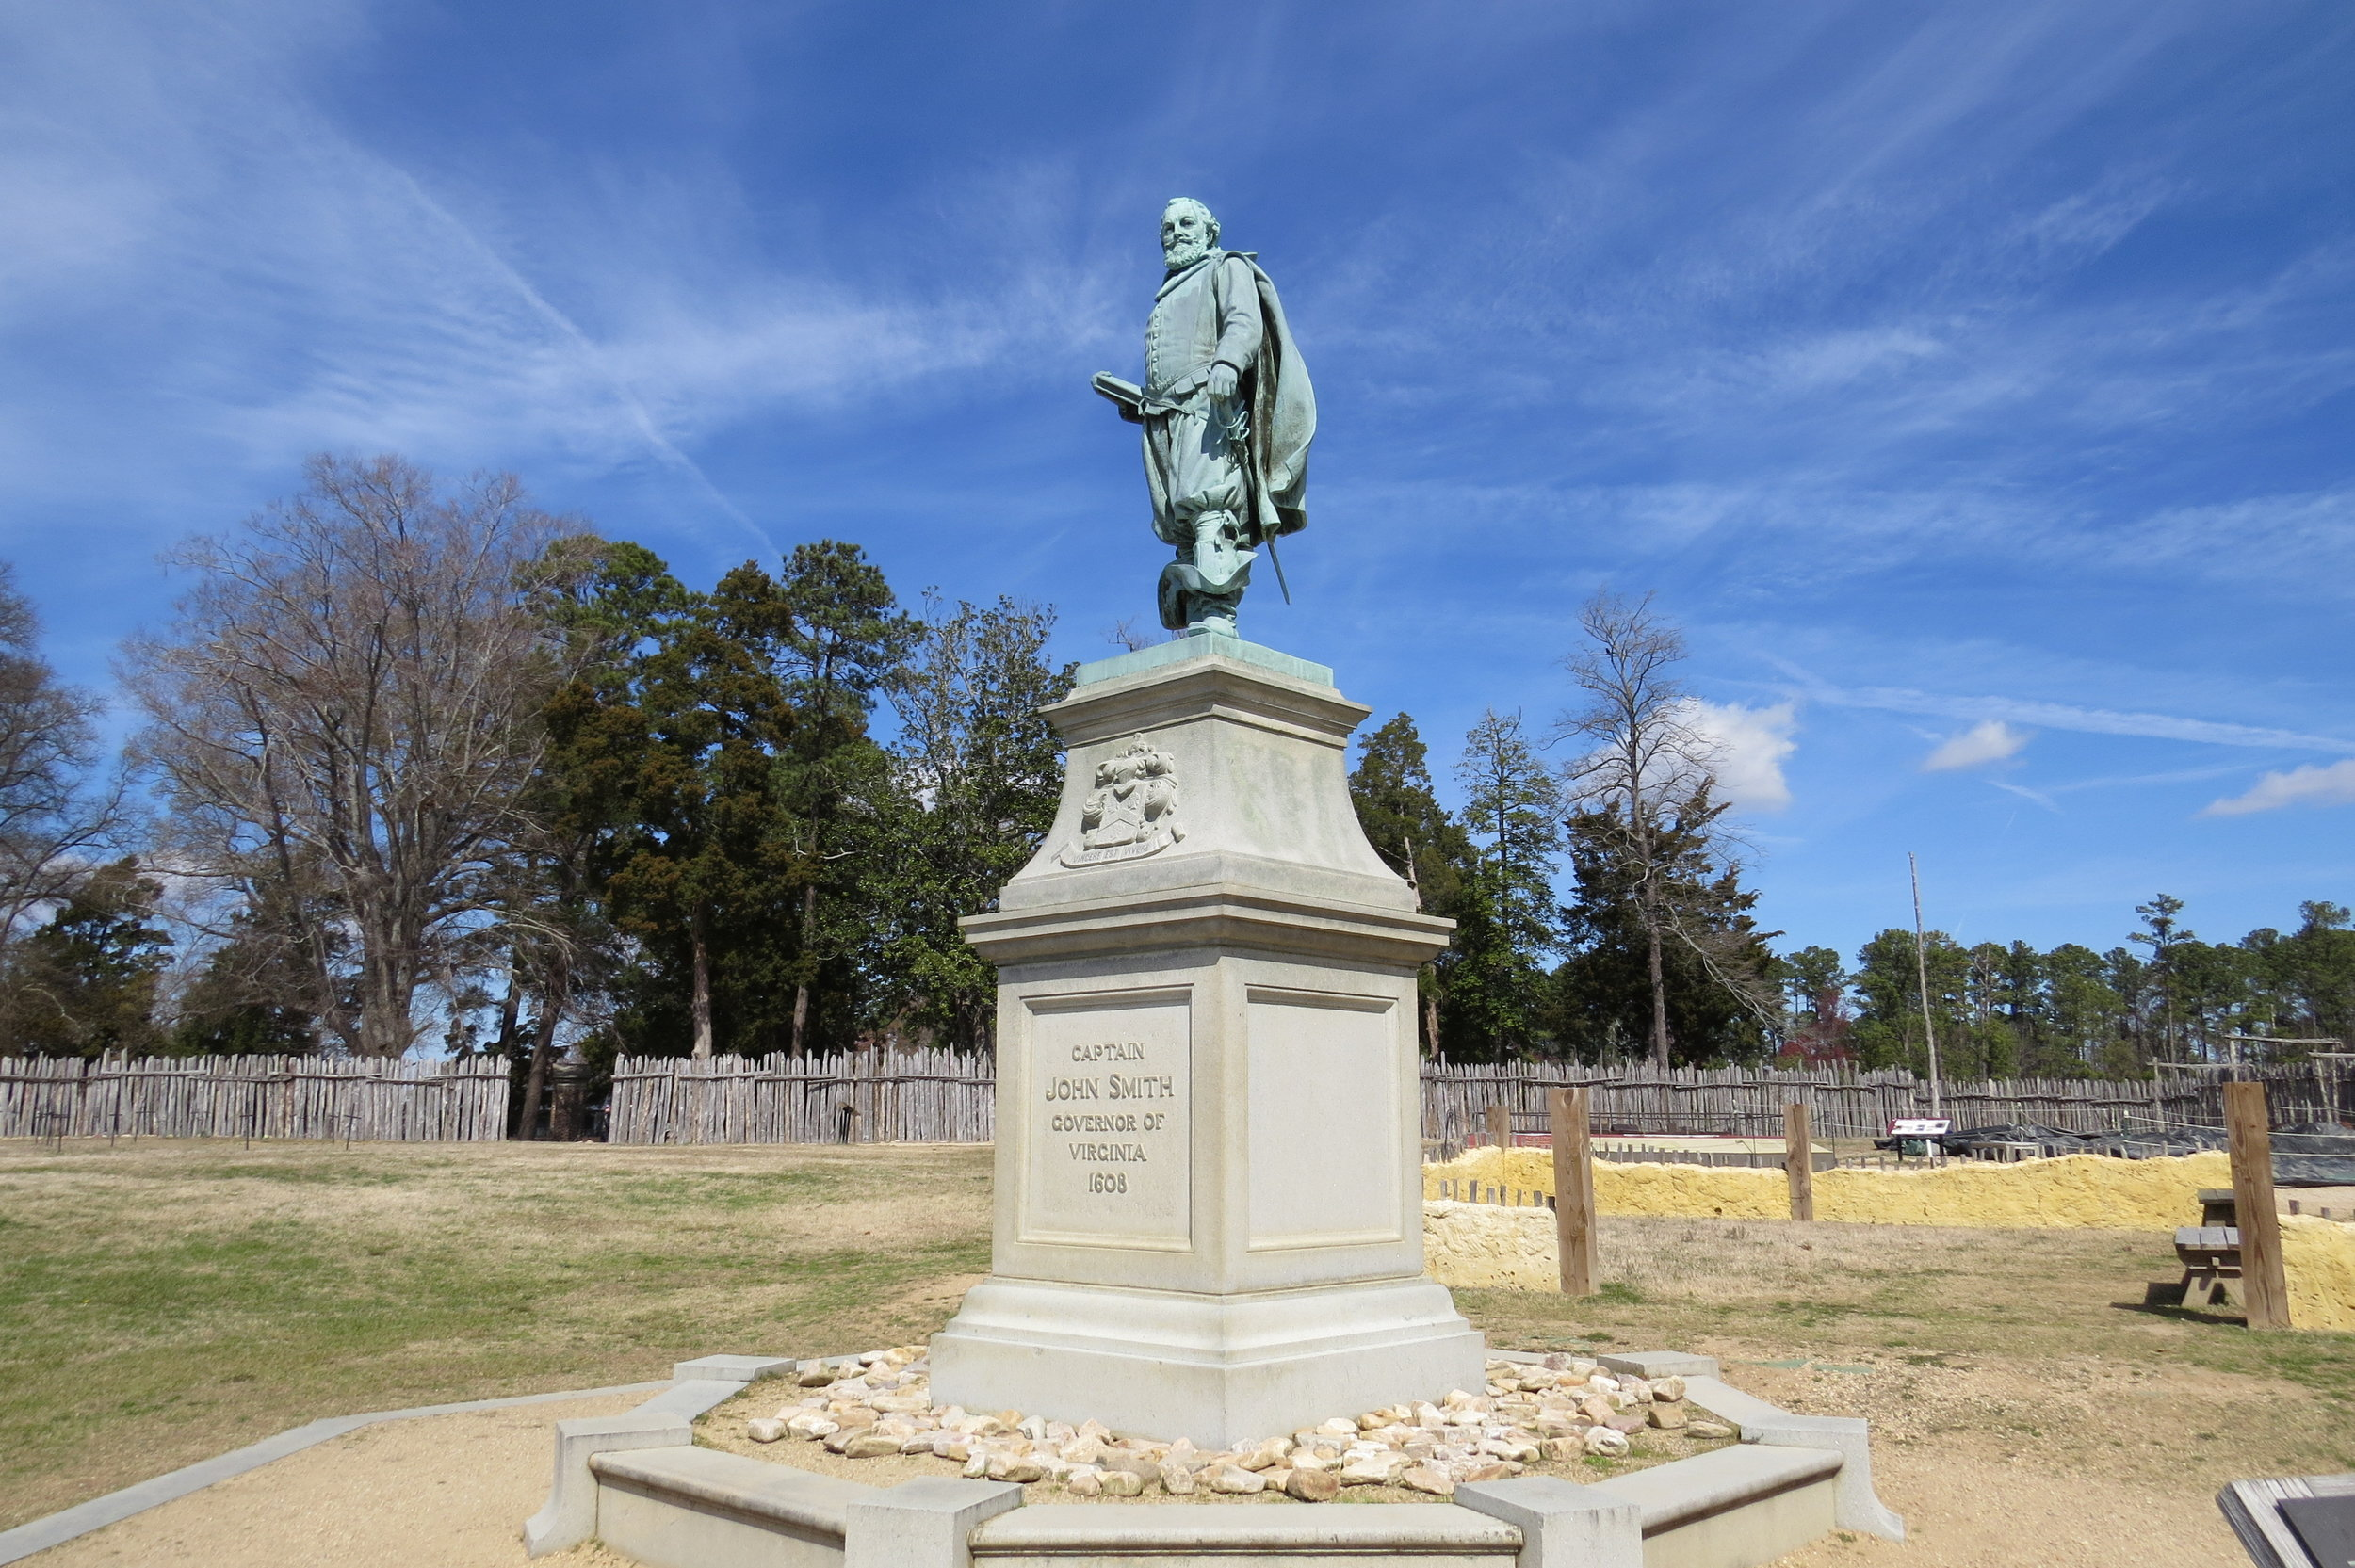 colonial national historical park -     historic jamestowne   - jamestown, VA - 2017